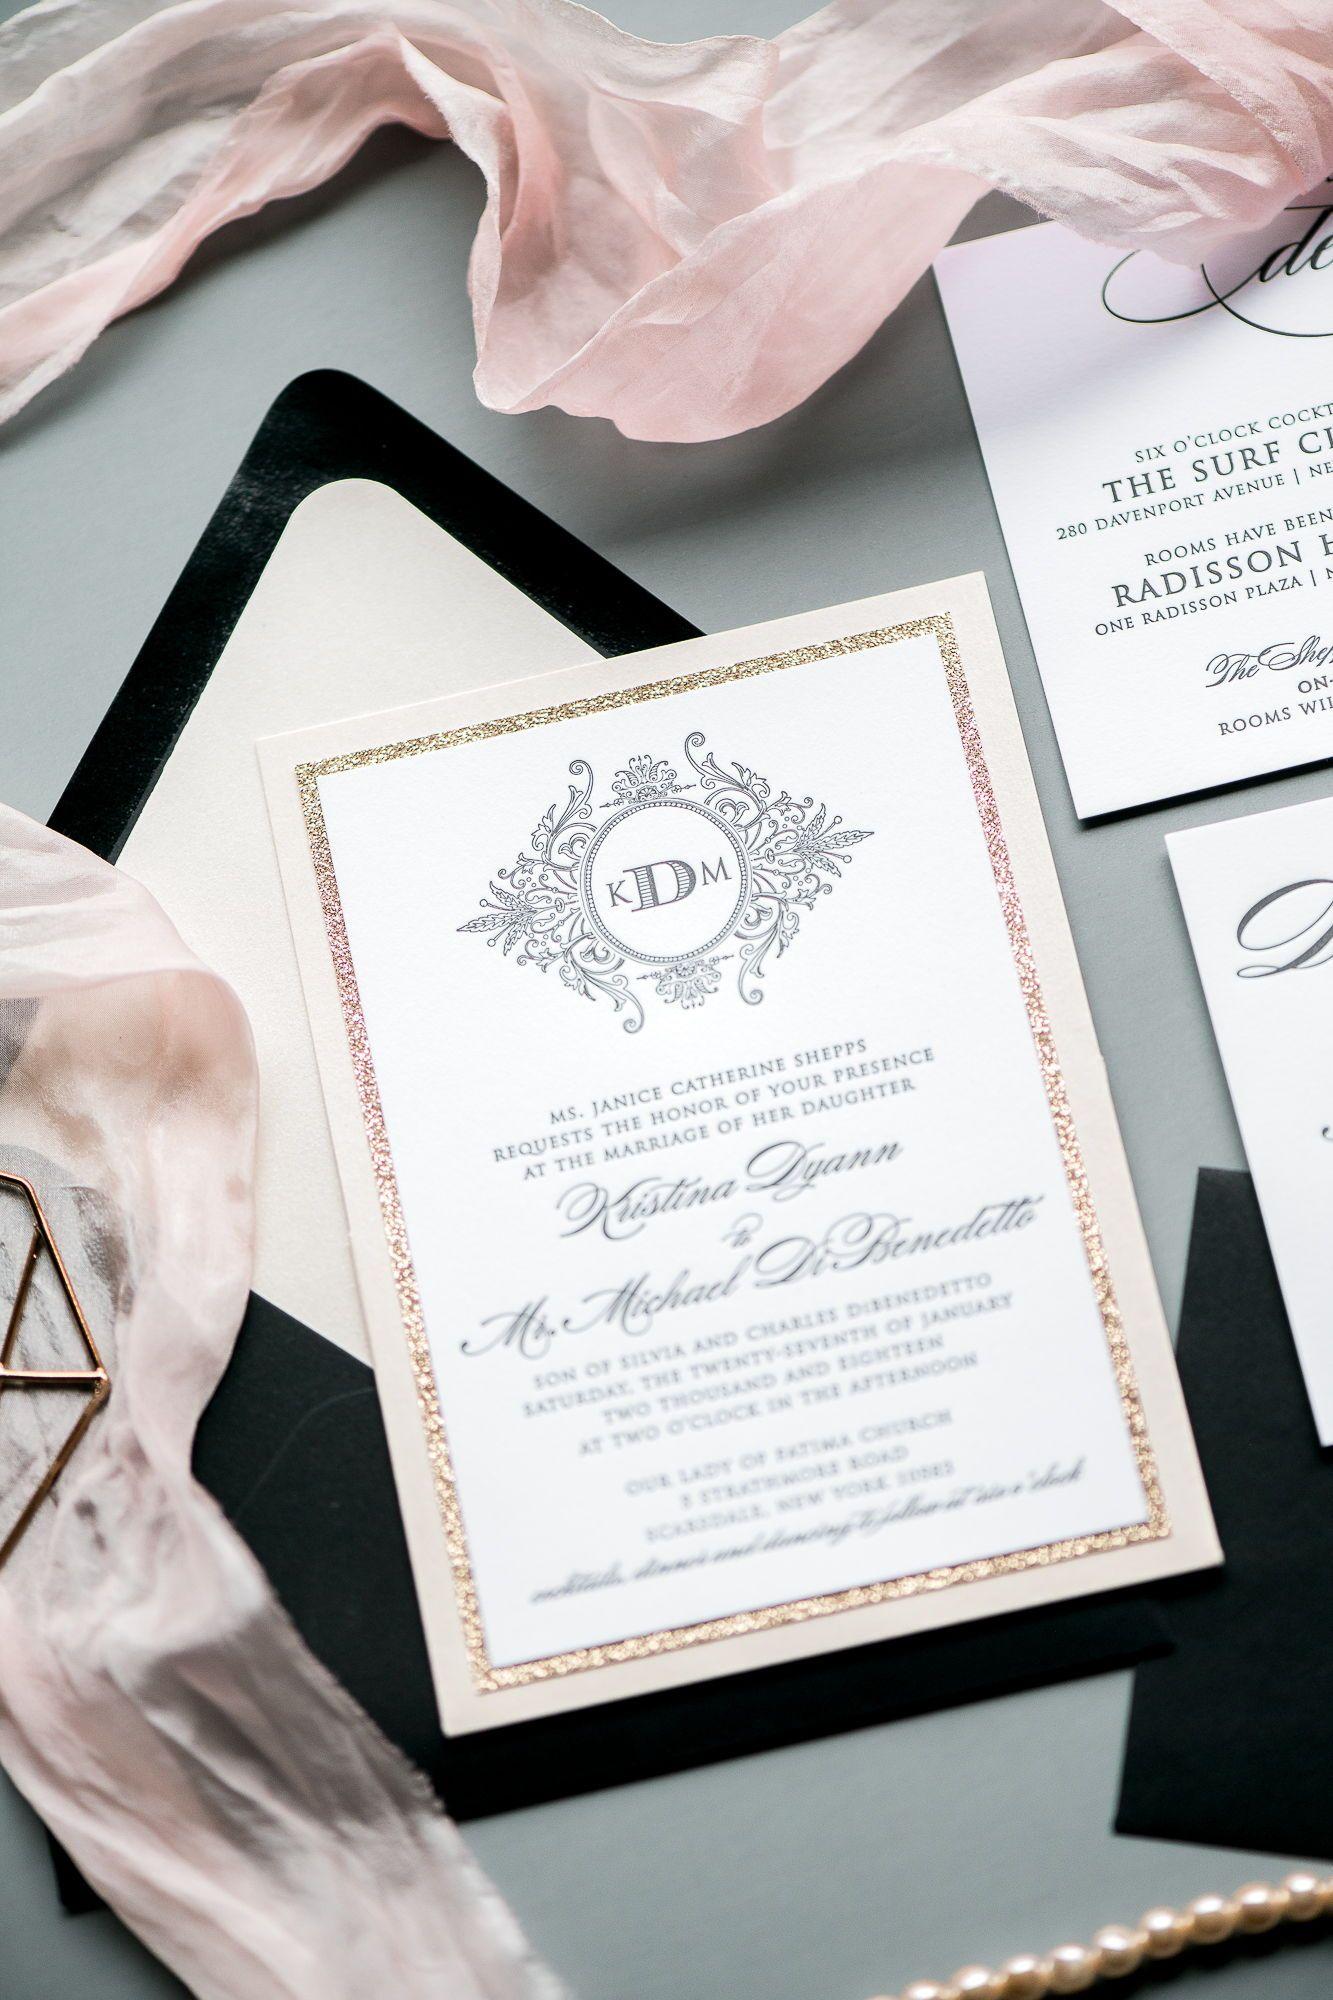 Jupiter And Juno Wedding Invitation Suite Abigail Modern And Elegant Monogram I Wedding Invitations Letterpress Wedding Invitations Blush Wedding Invitations